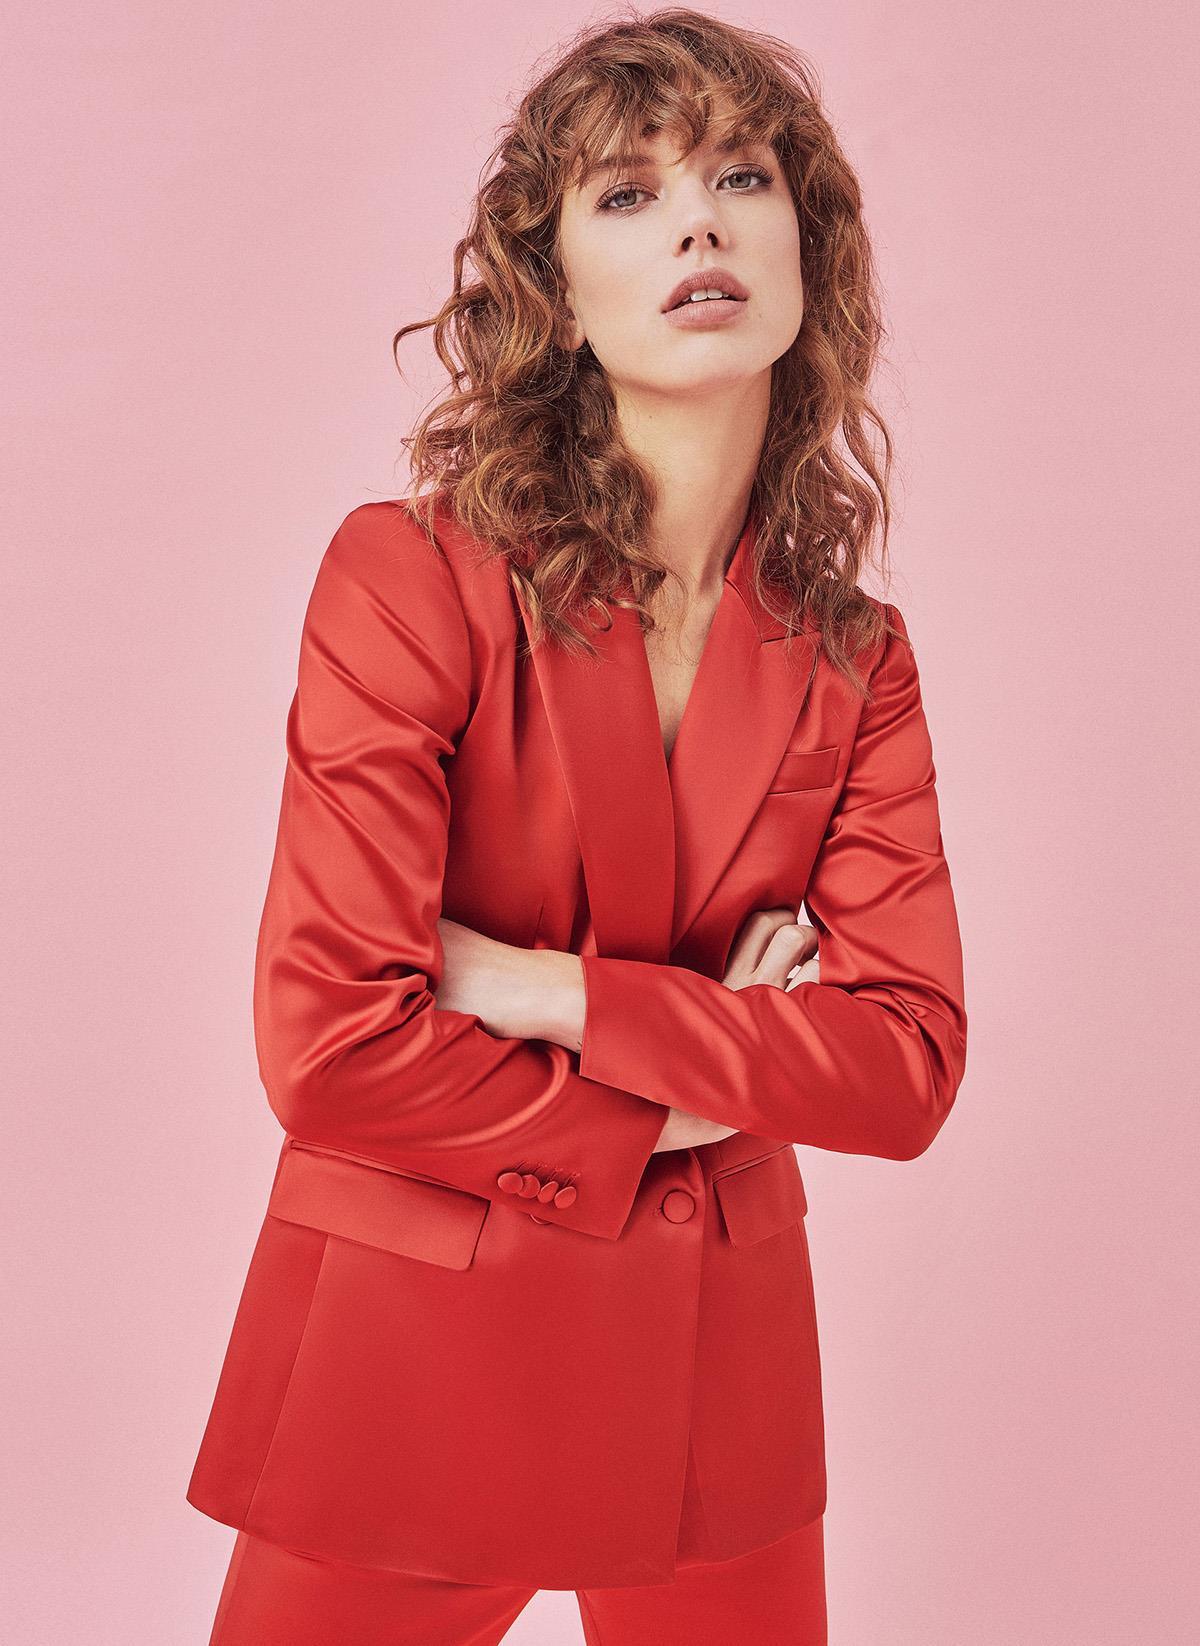 59fdff29bb5 blazer-roja-traje-uterque. Traje de chaqueta rojo